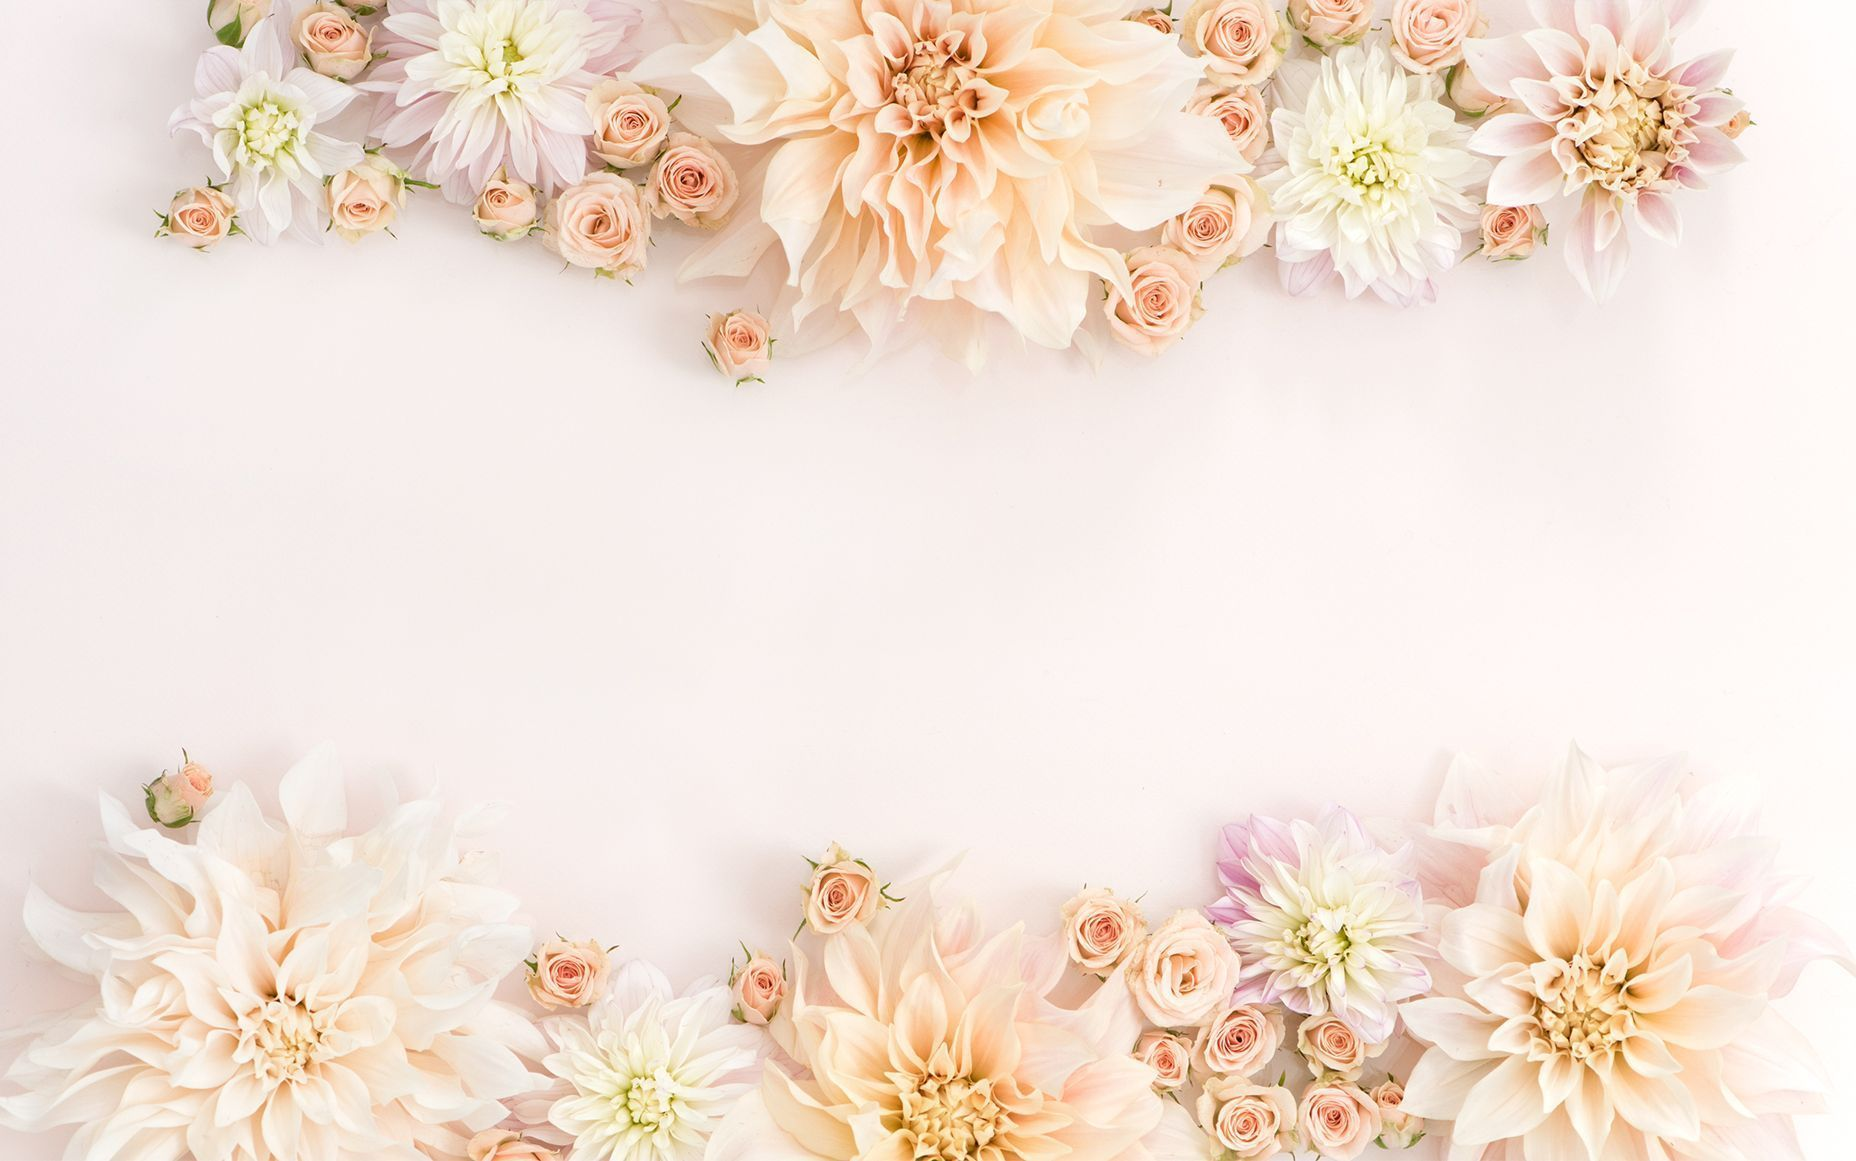 Rose Gold Wallpaper Flower Wedding Bouquet In 2020 Laptop Wallpaper Desktop Wallpapers Rose Gold Wallpaper Laptop Wallpaper